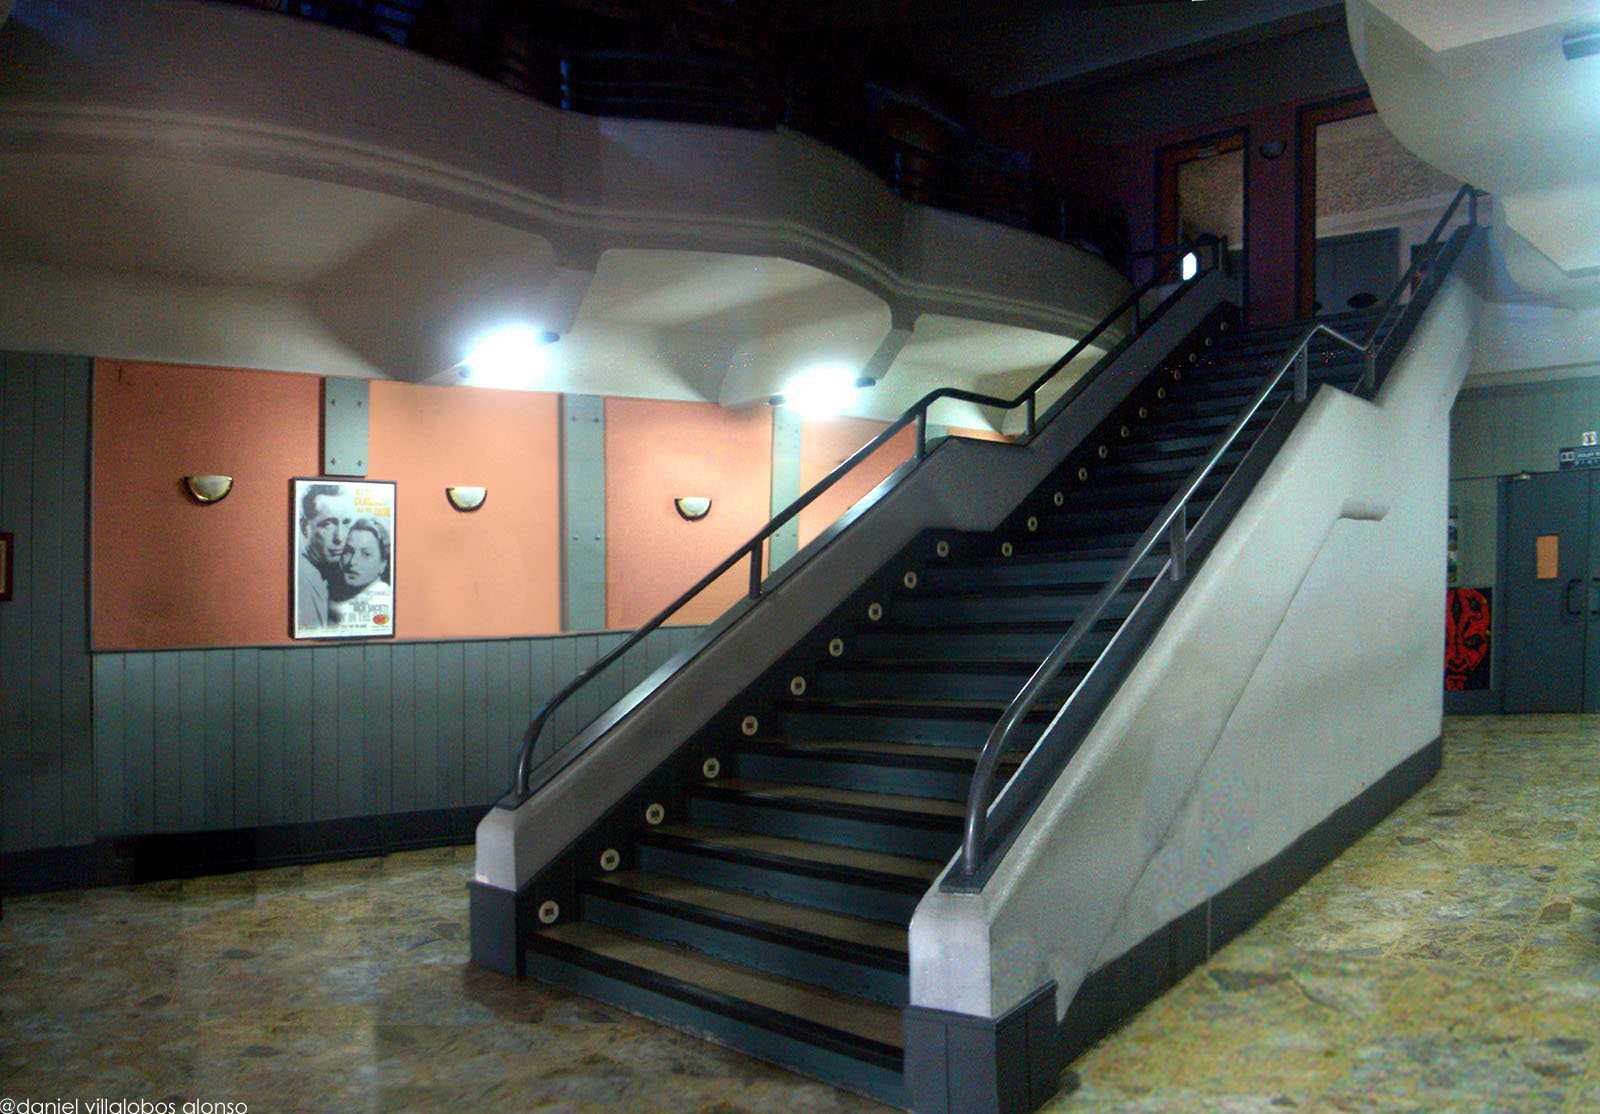 danielvillalobos-cines-digitalphotographies-modernarchitecture-33